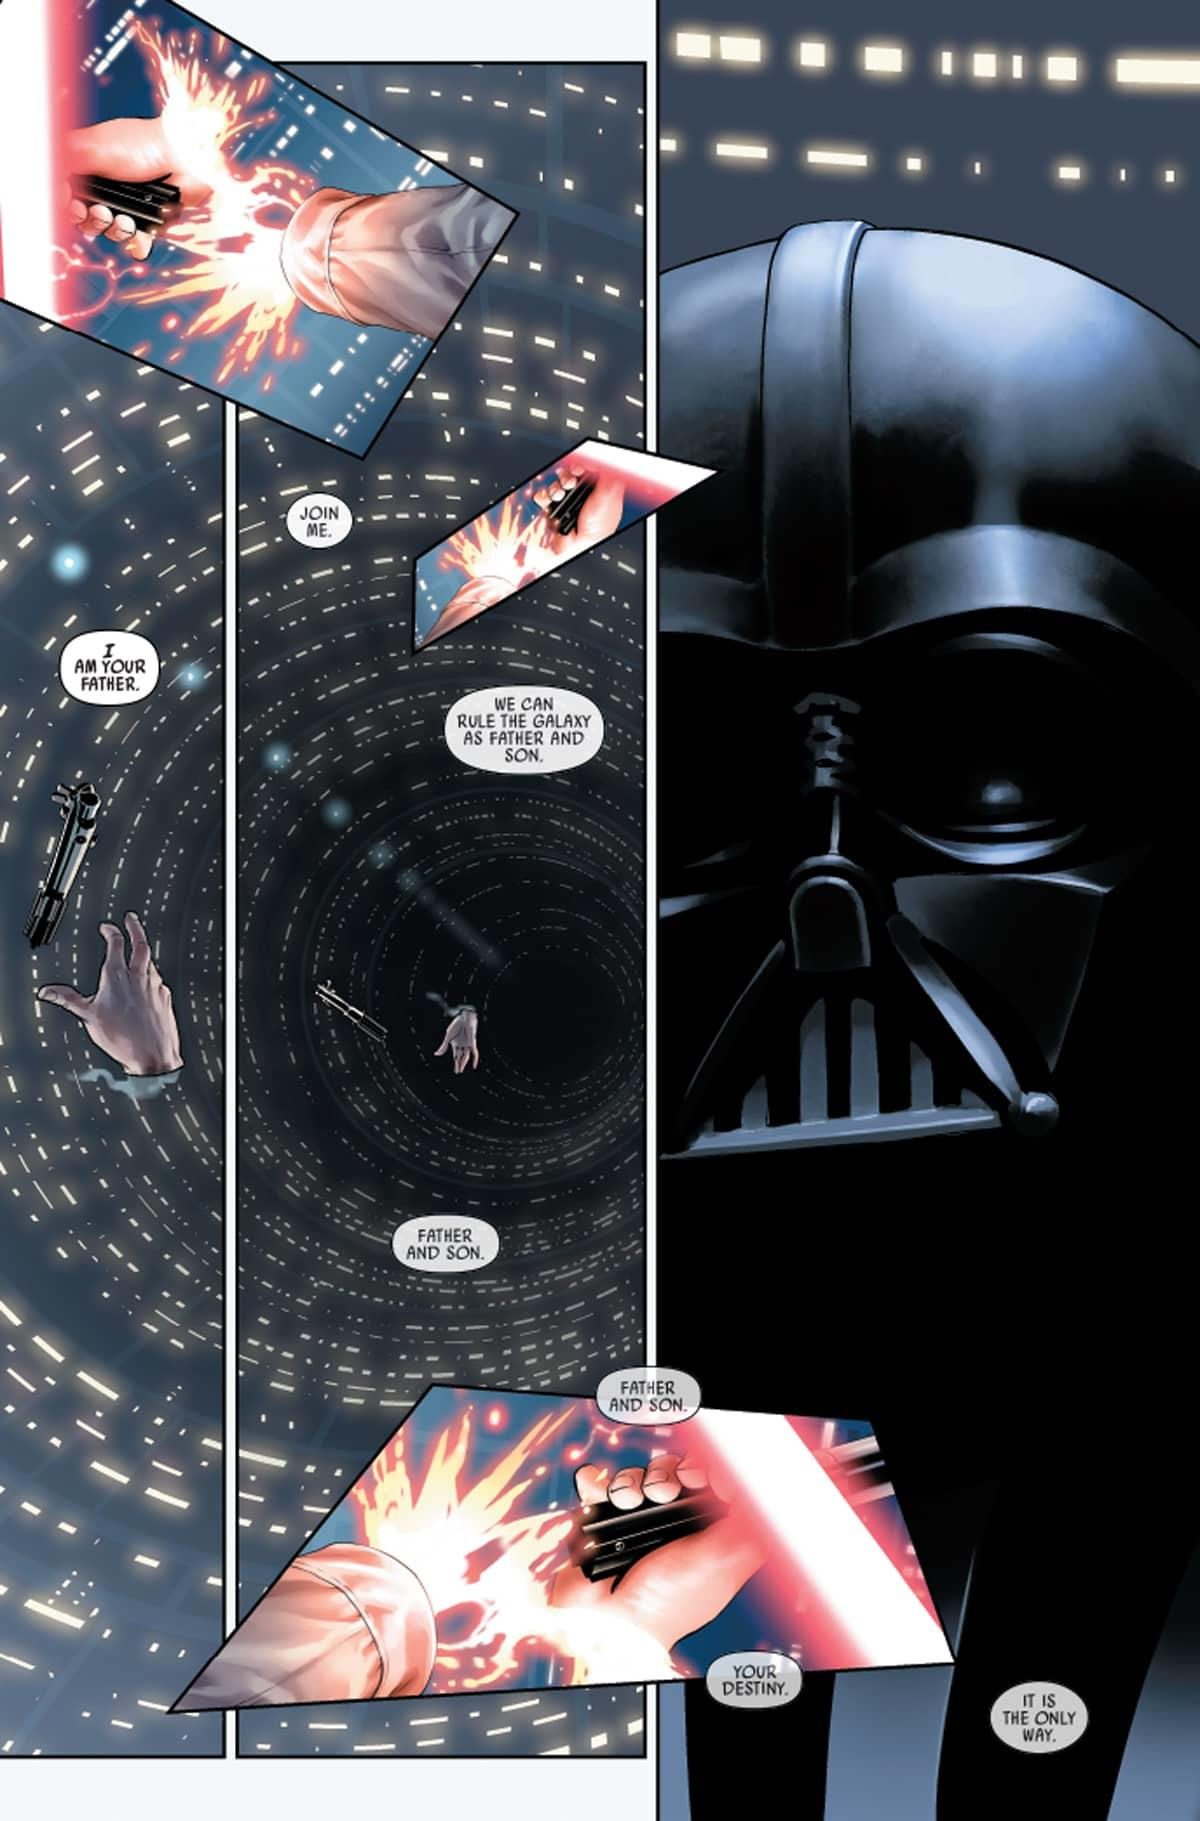 Star Wars #1: Luke loses his hand.